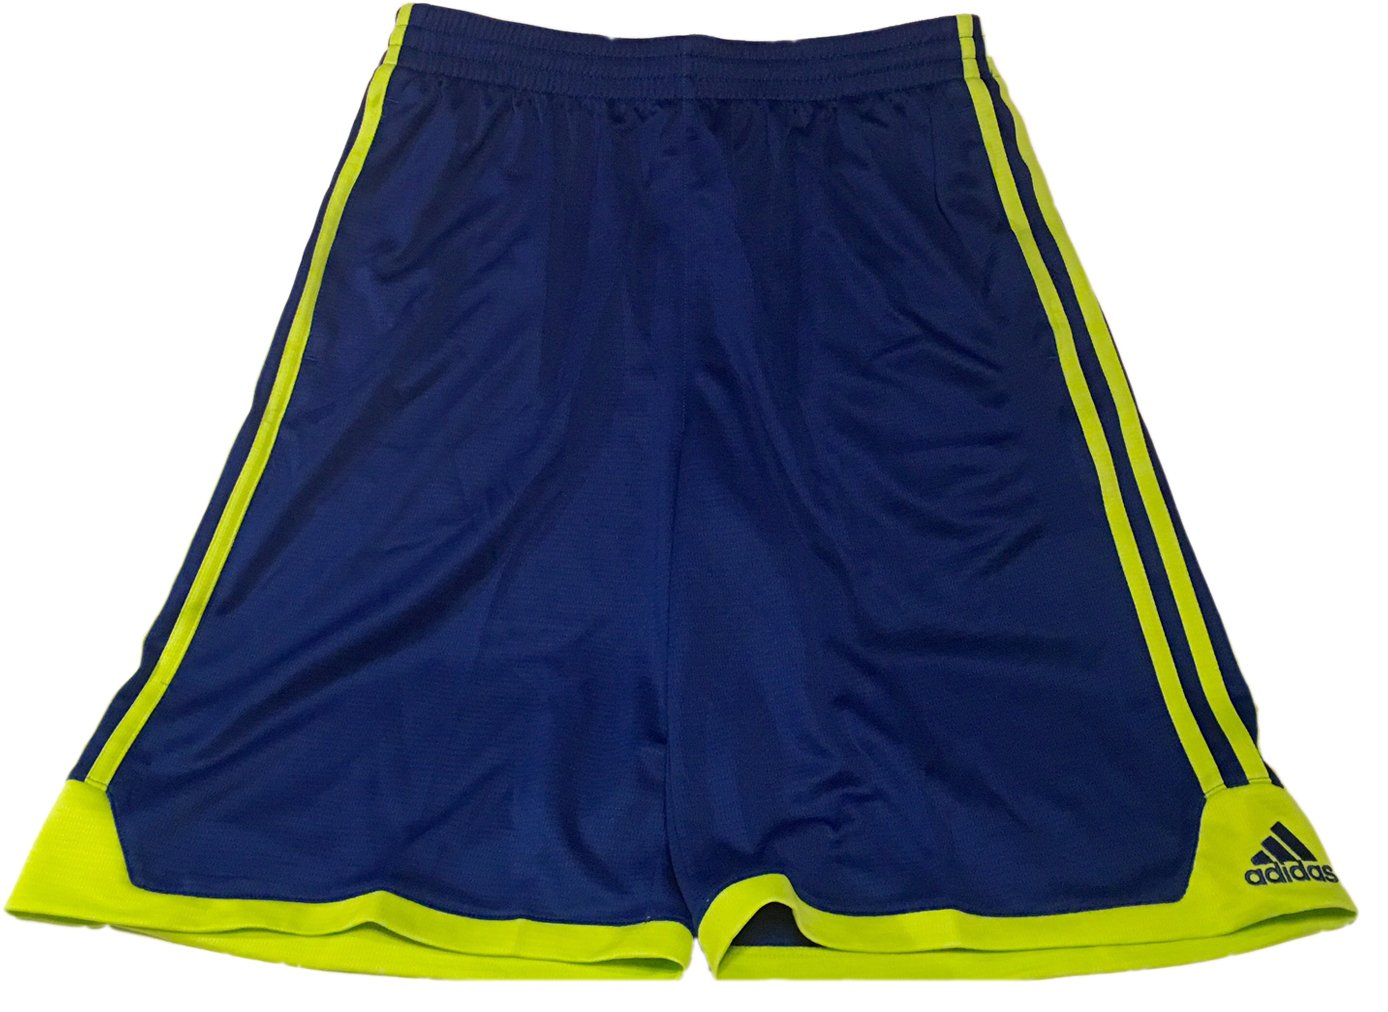 adidas Performance Mesh Athletic Shorts, Blue/Yellow Stripes, Large 14-16